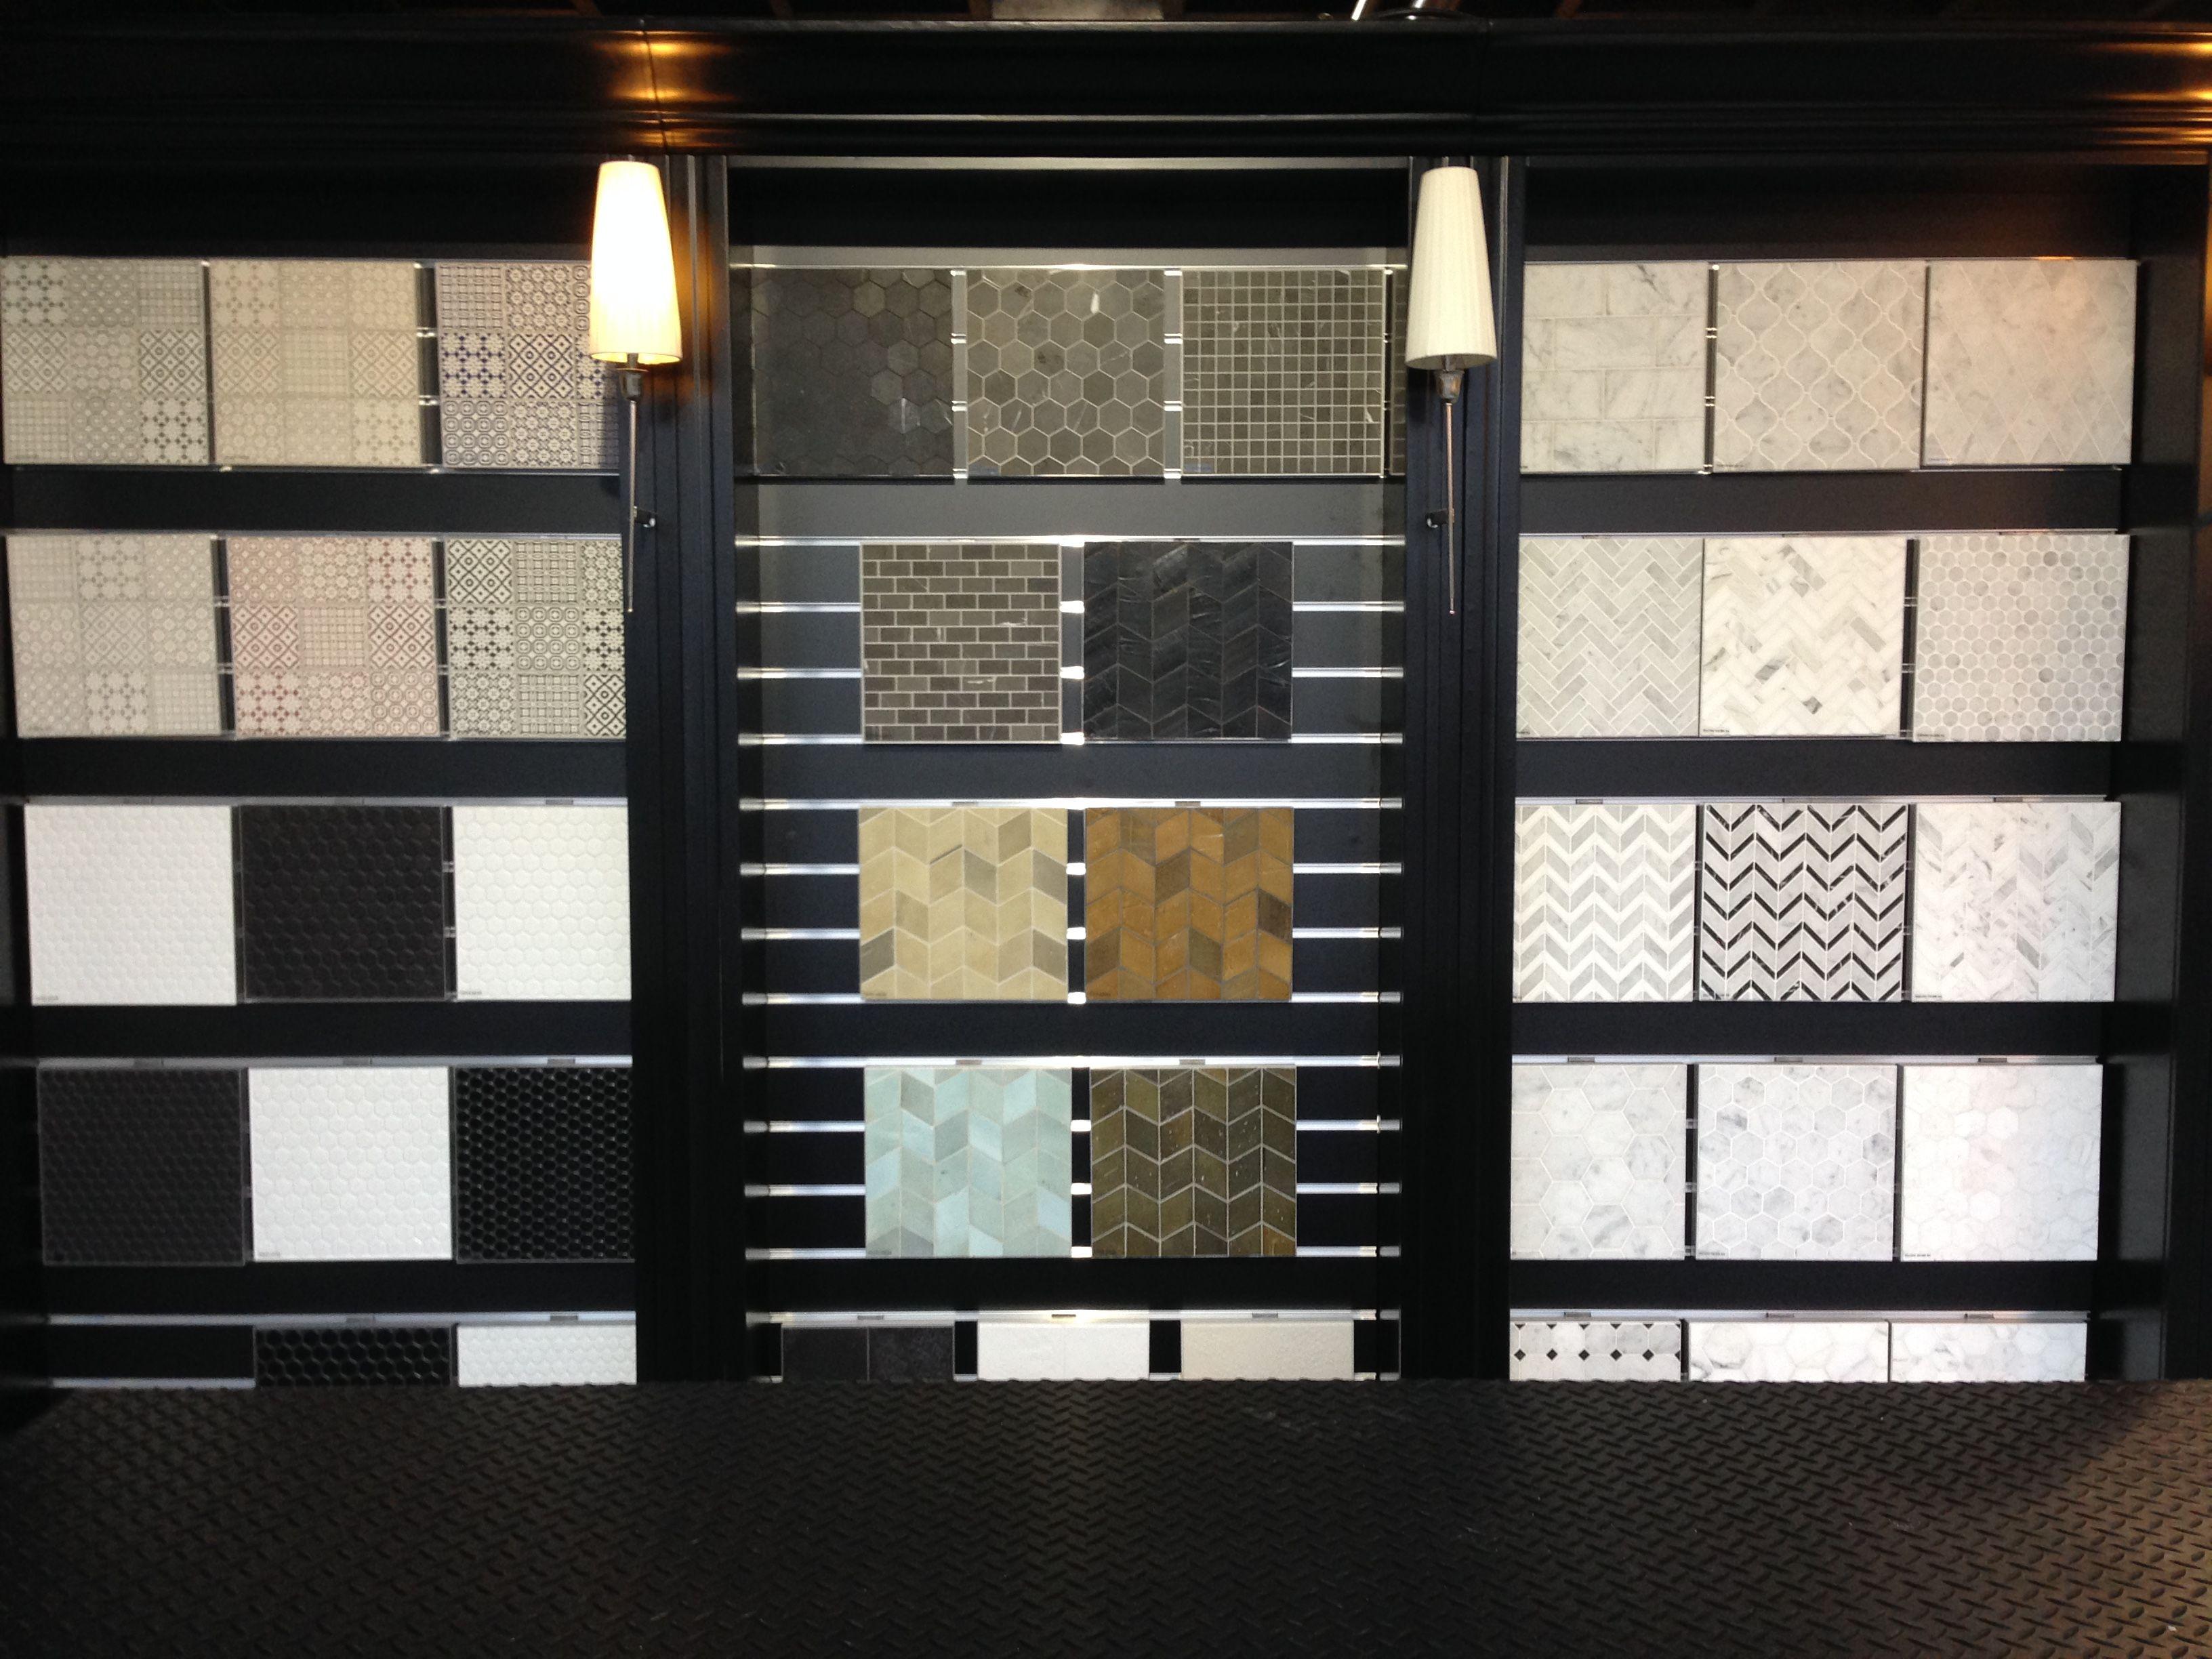 Perini tiles tile displays at the sandringham showroom ceramic perini tiles tile displays at the sandringham showroom dailygadgetfo Images